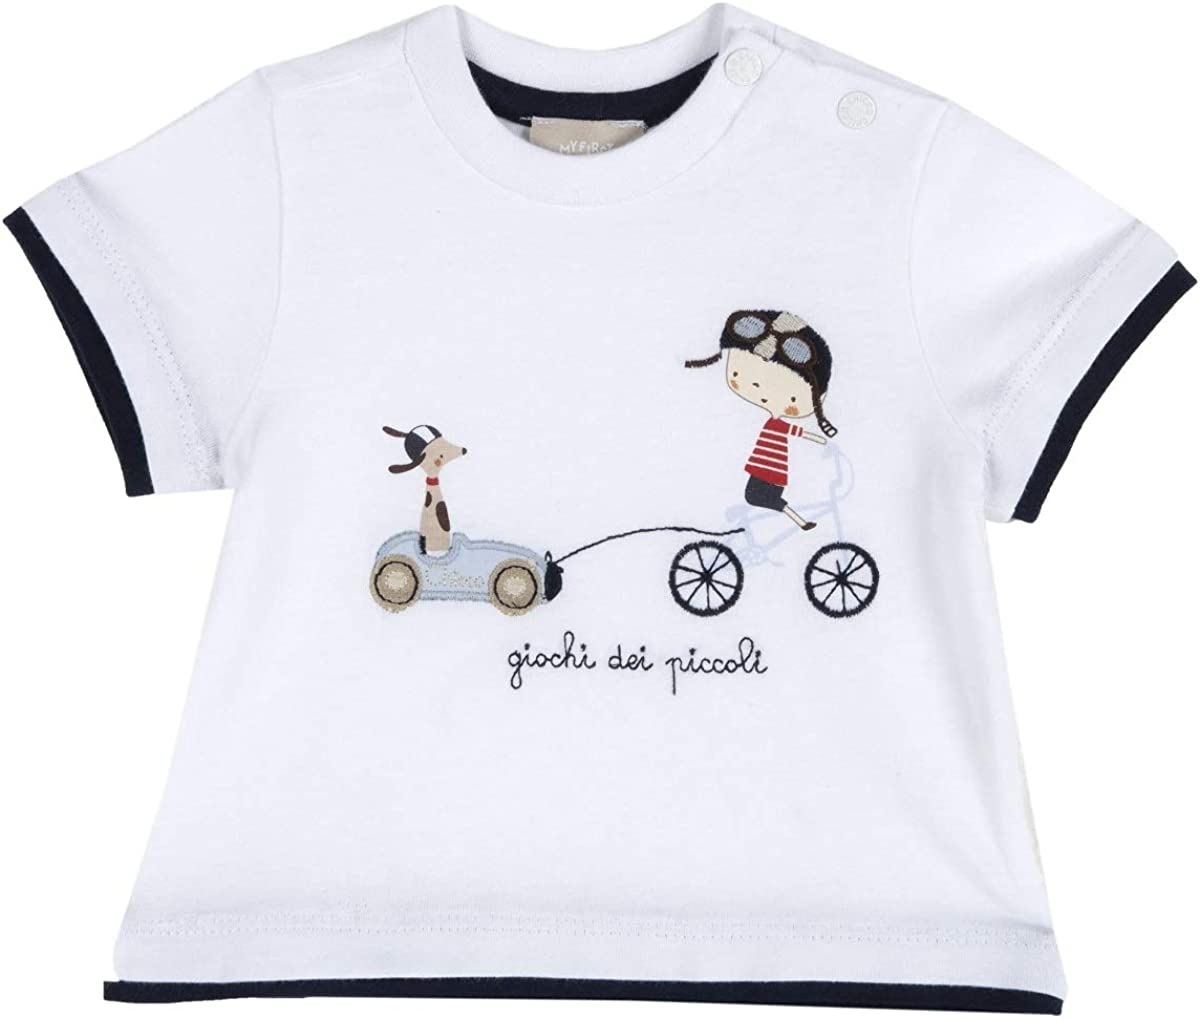 Chicco A Manica Corta T-Shirt Manches Courtes B/éb/é gar/çon